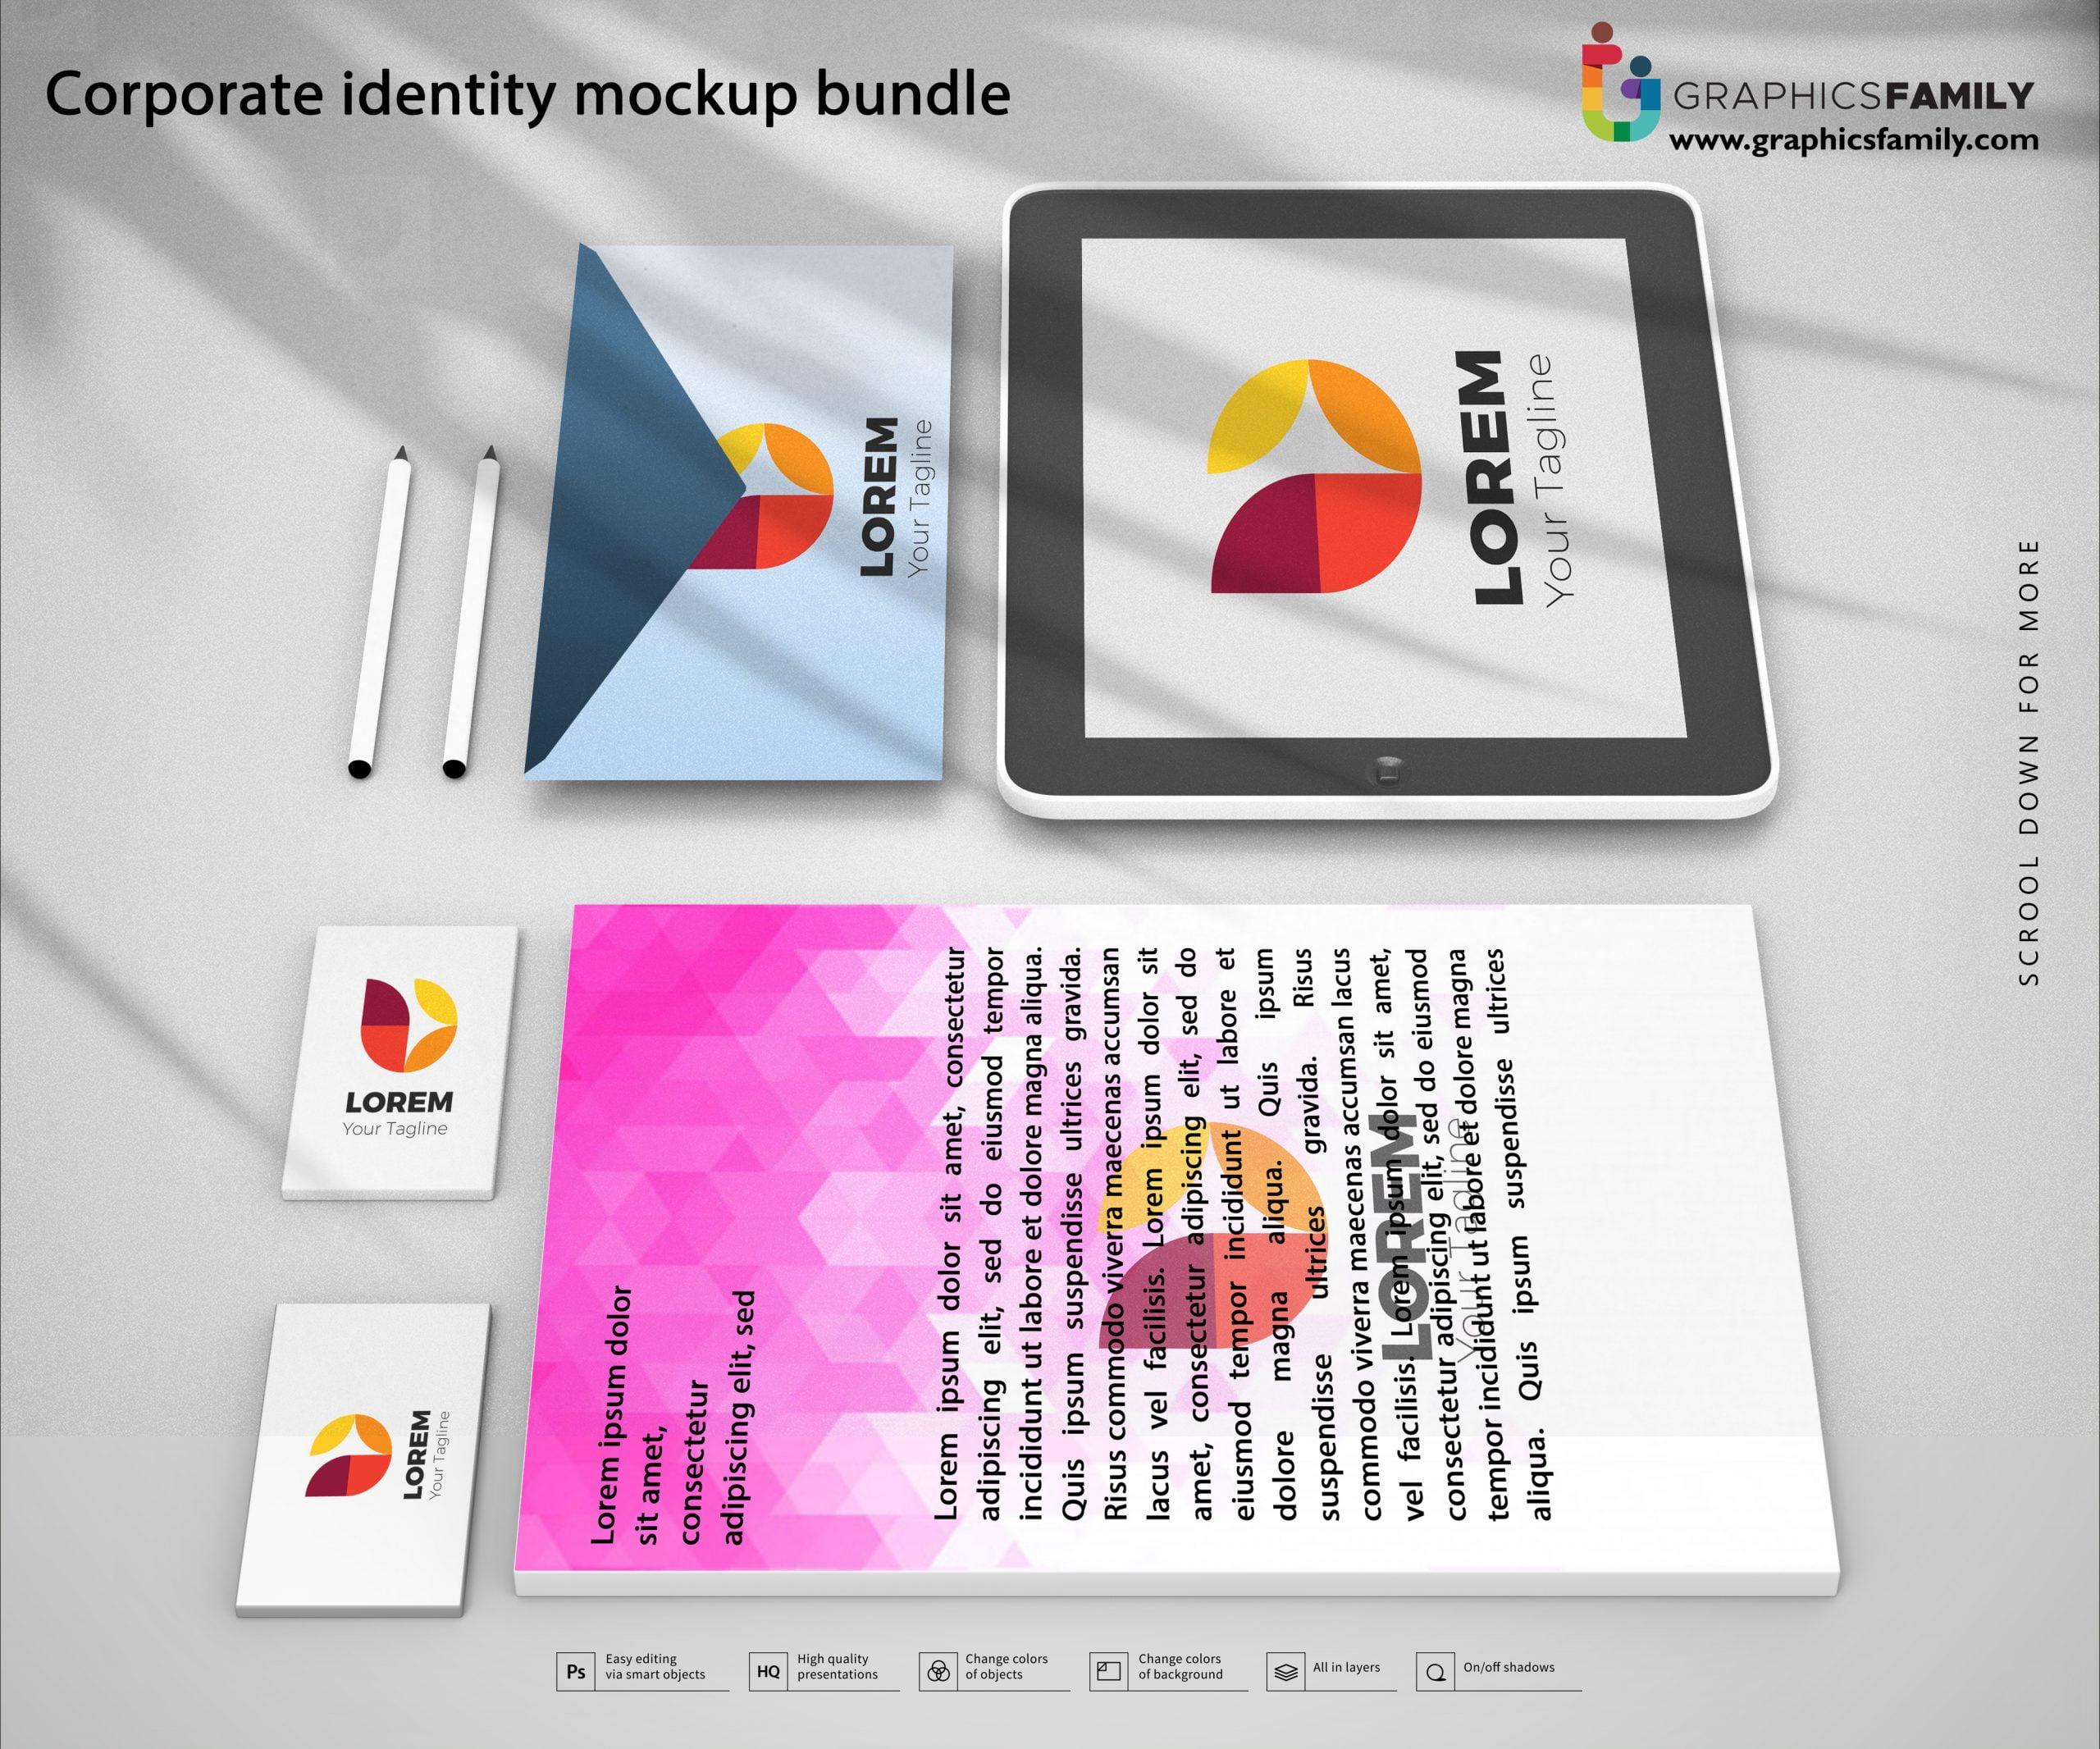 Corporate Identity Mockup Bundle Free PSD